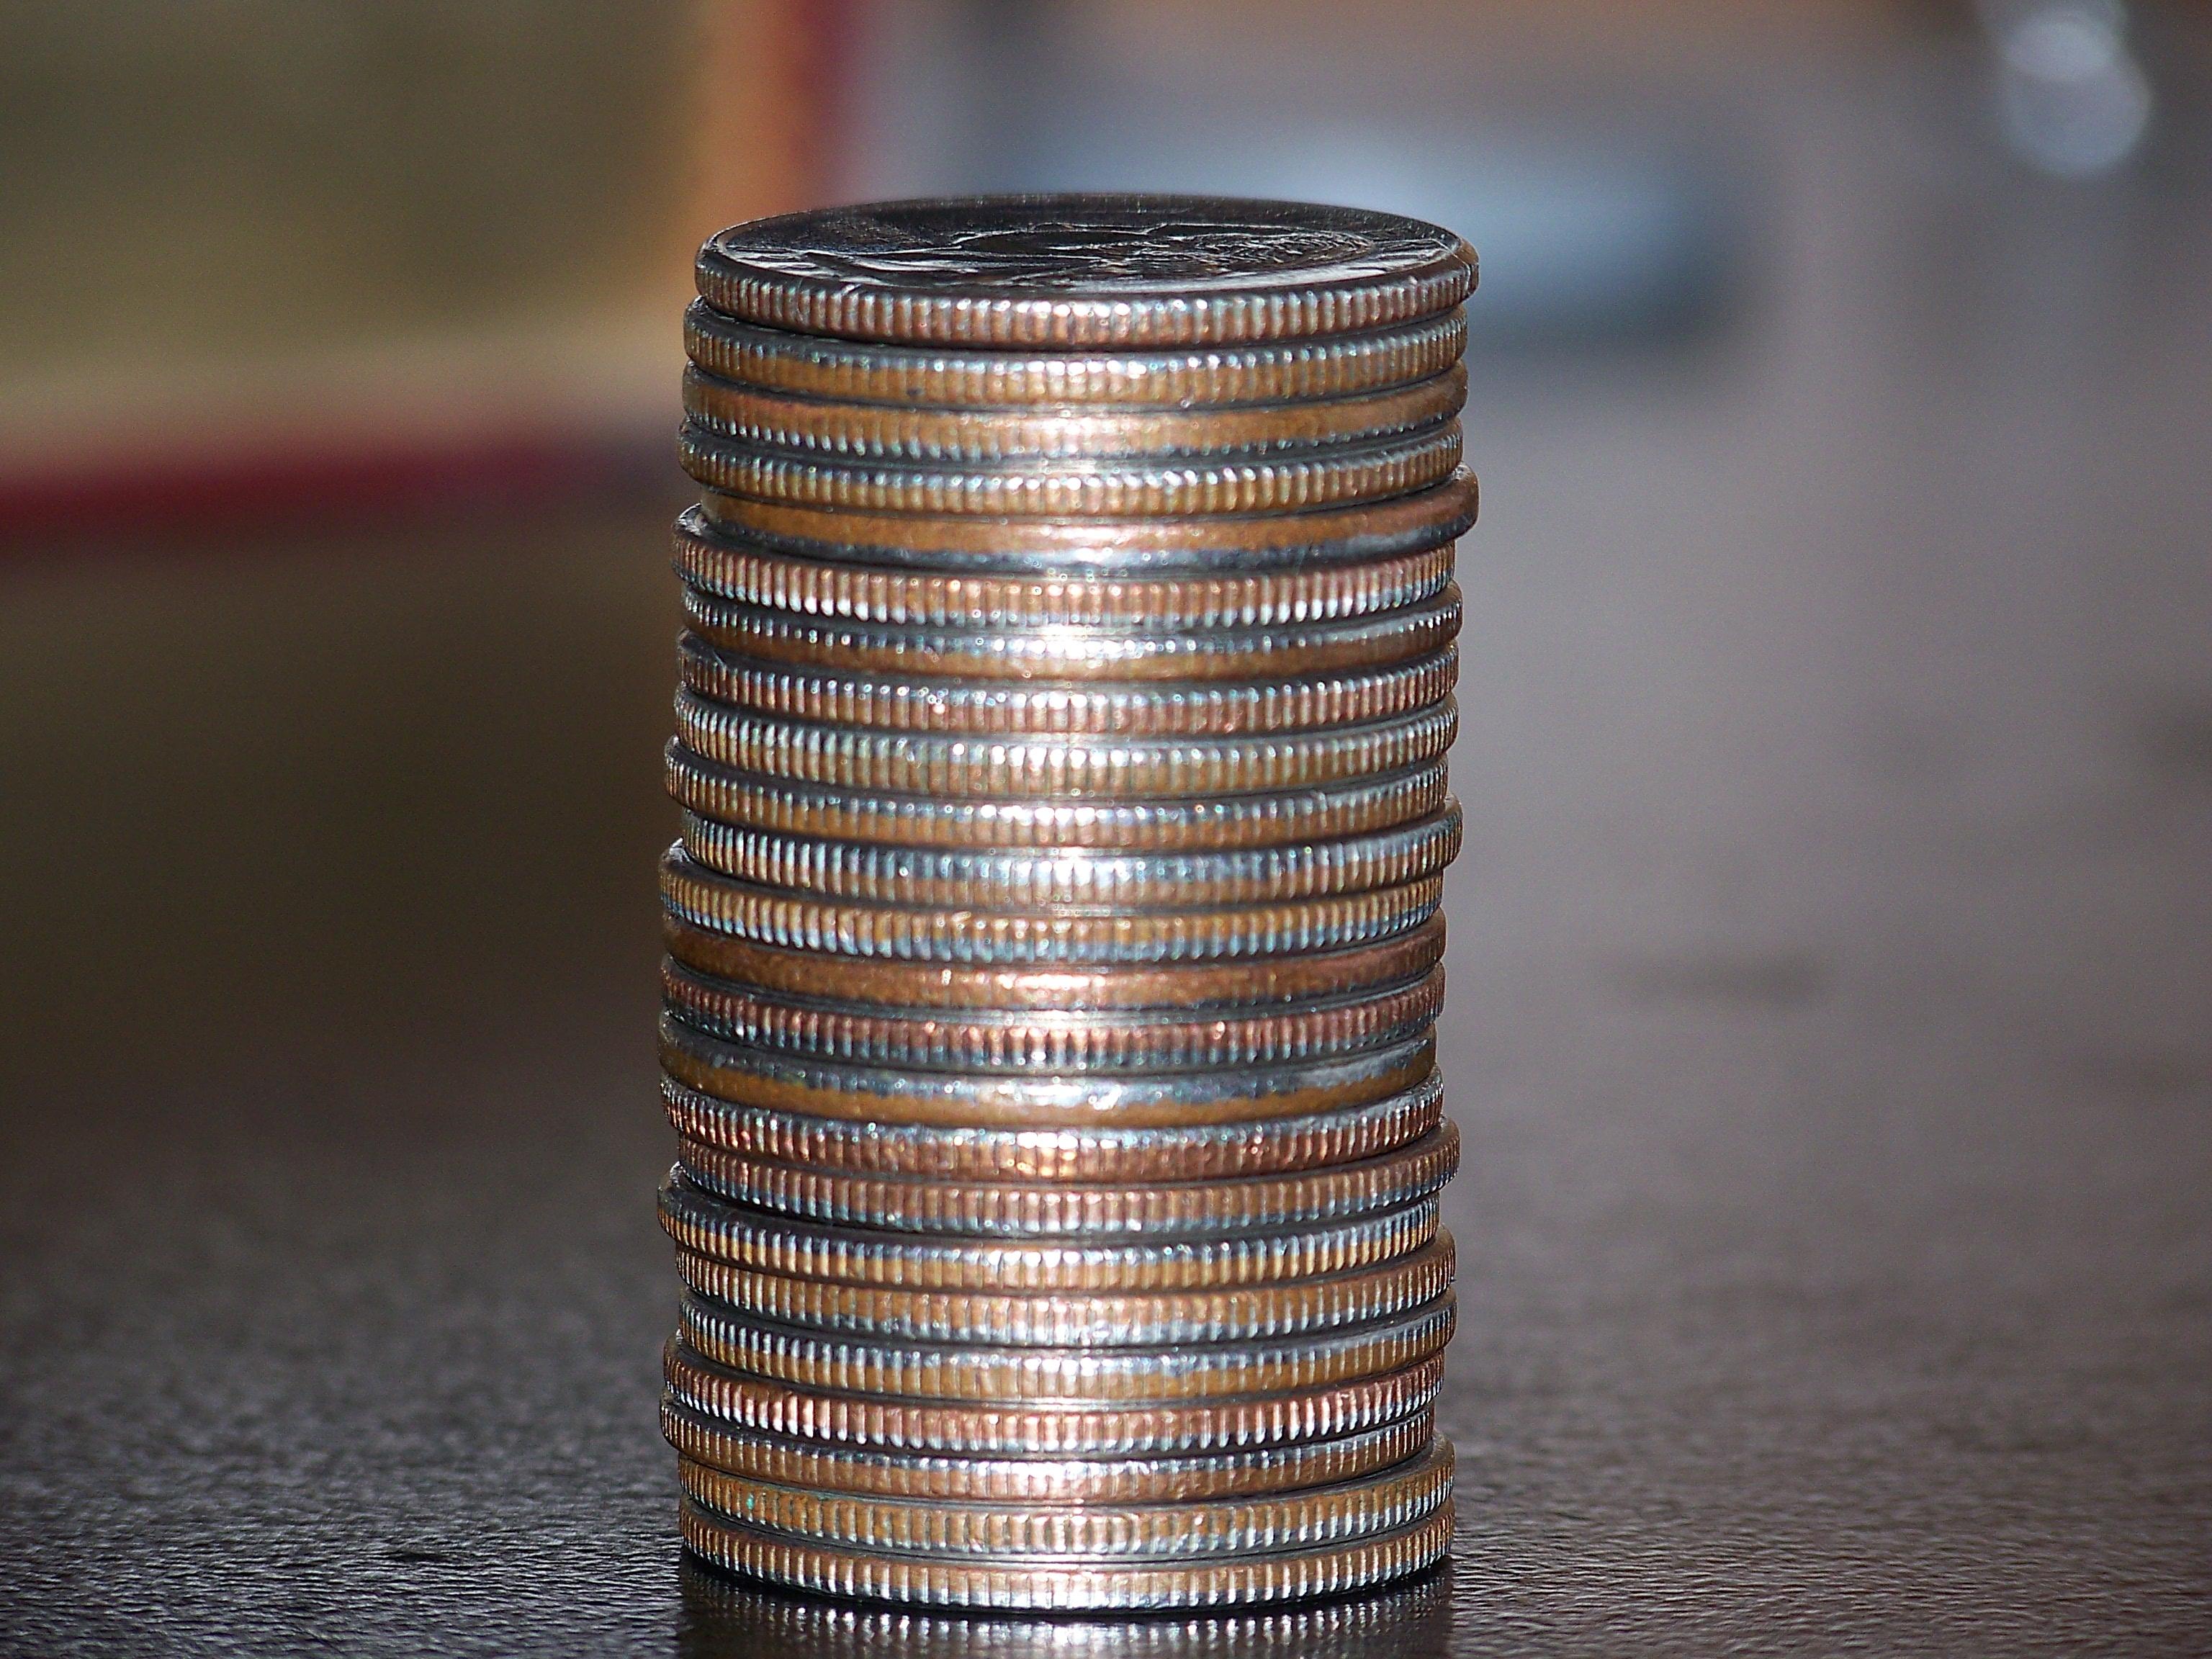 Exploring pocket sized quarter holders